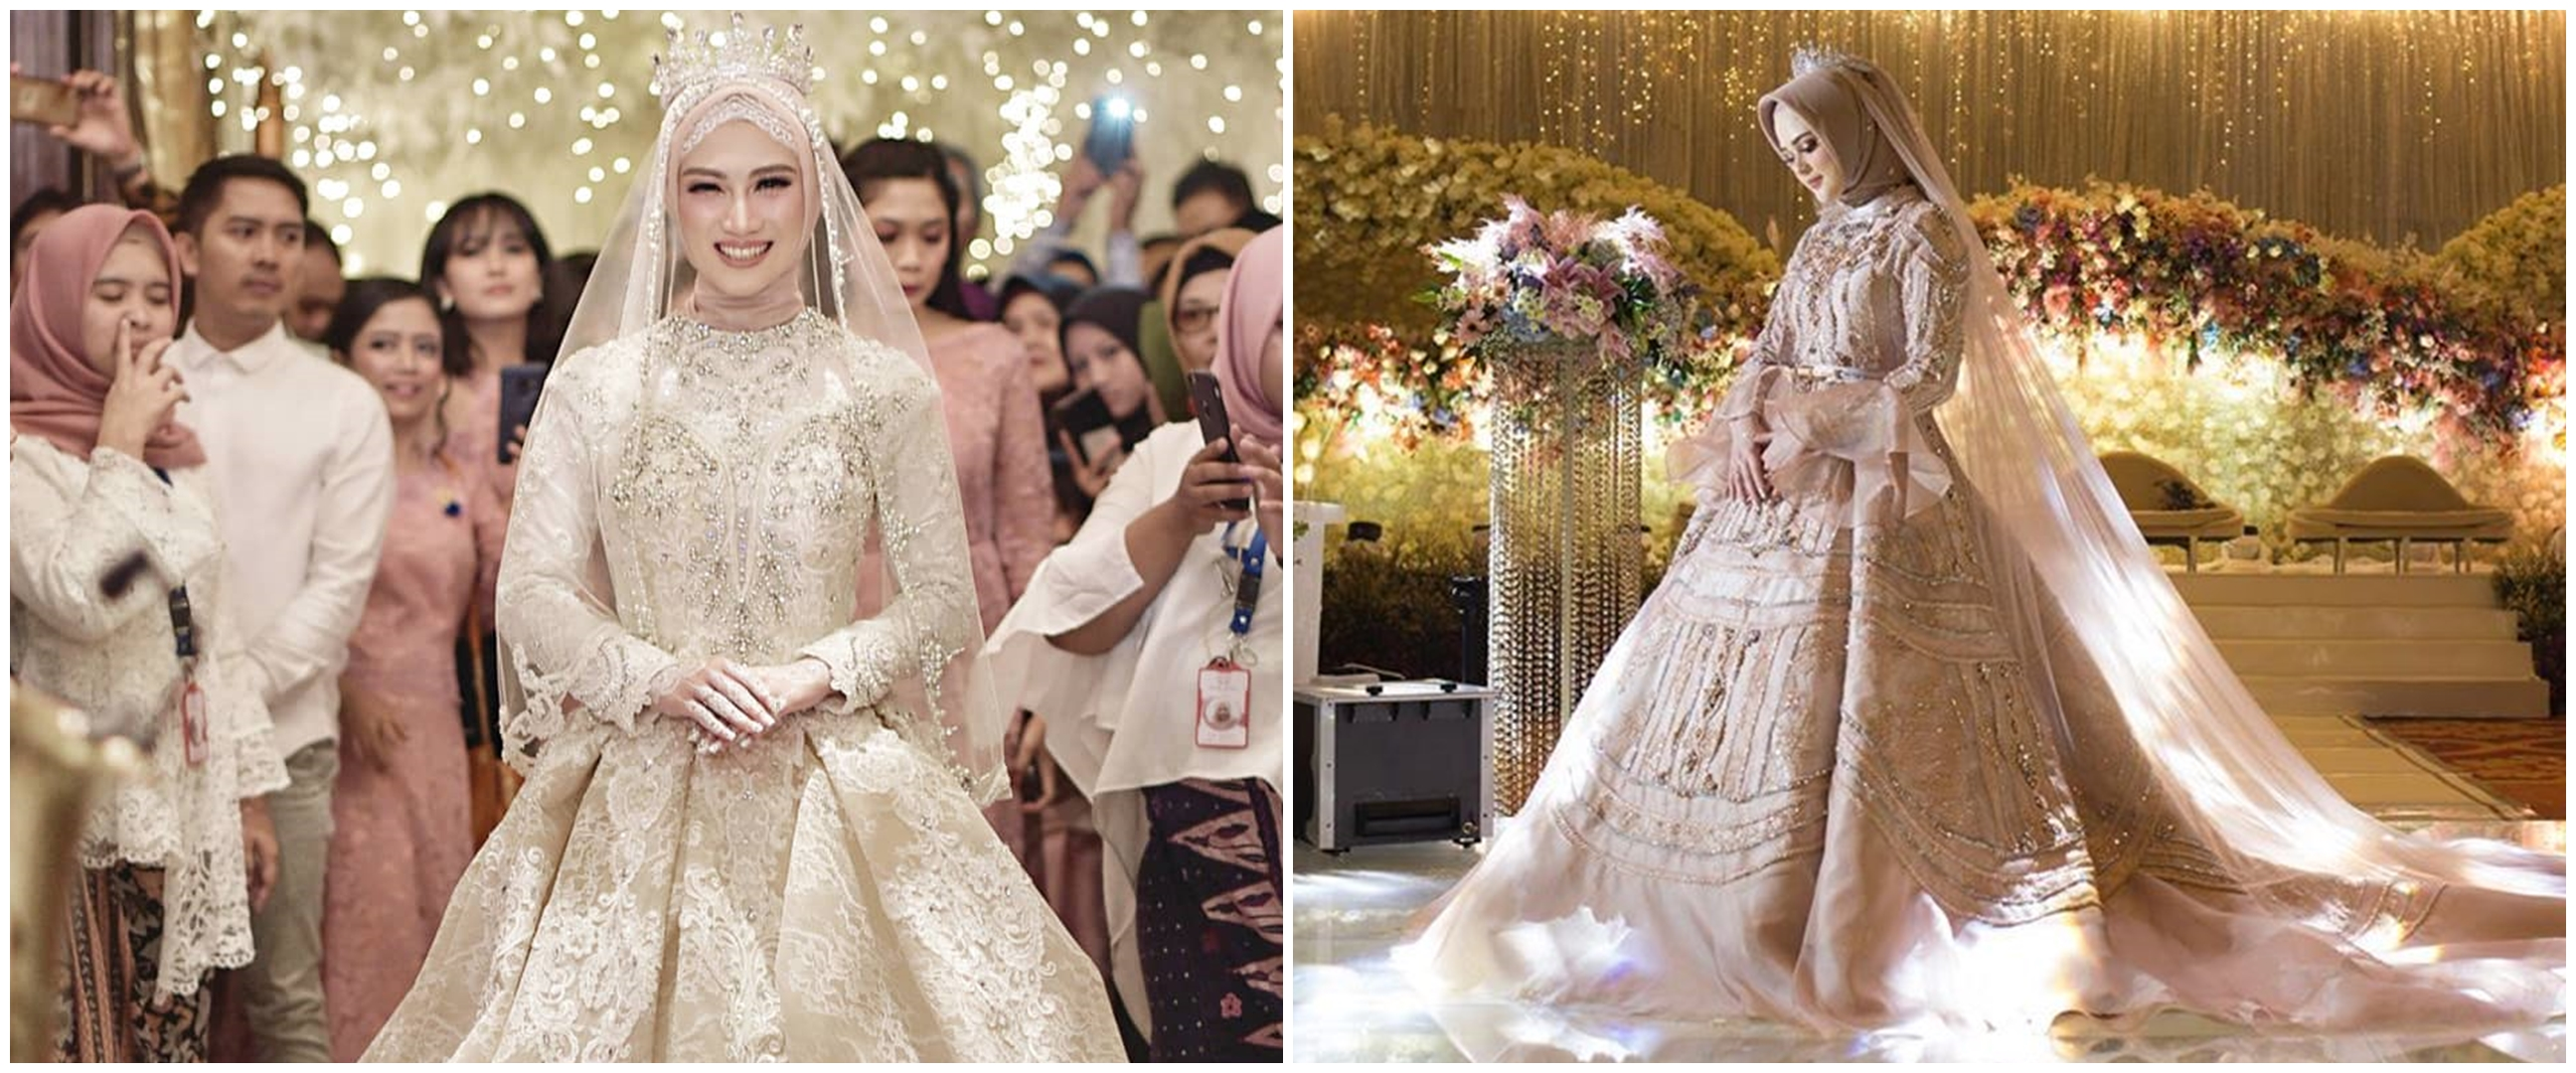 Inspirasi gaun pernikahan 10 seleb berhijab, elegan bak princess